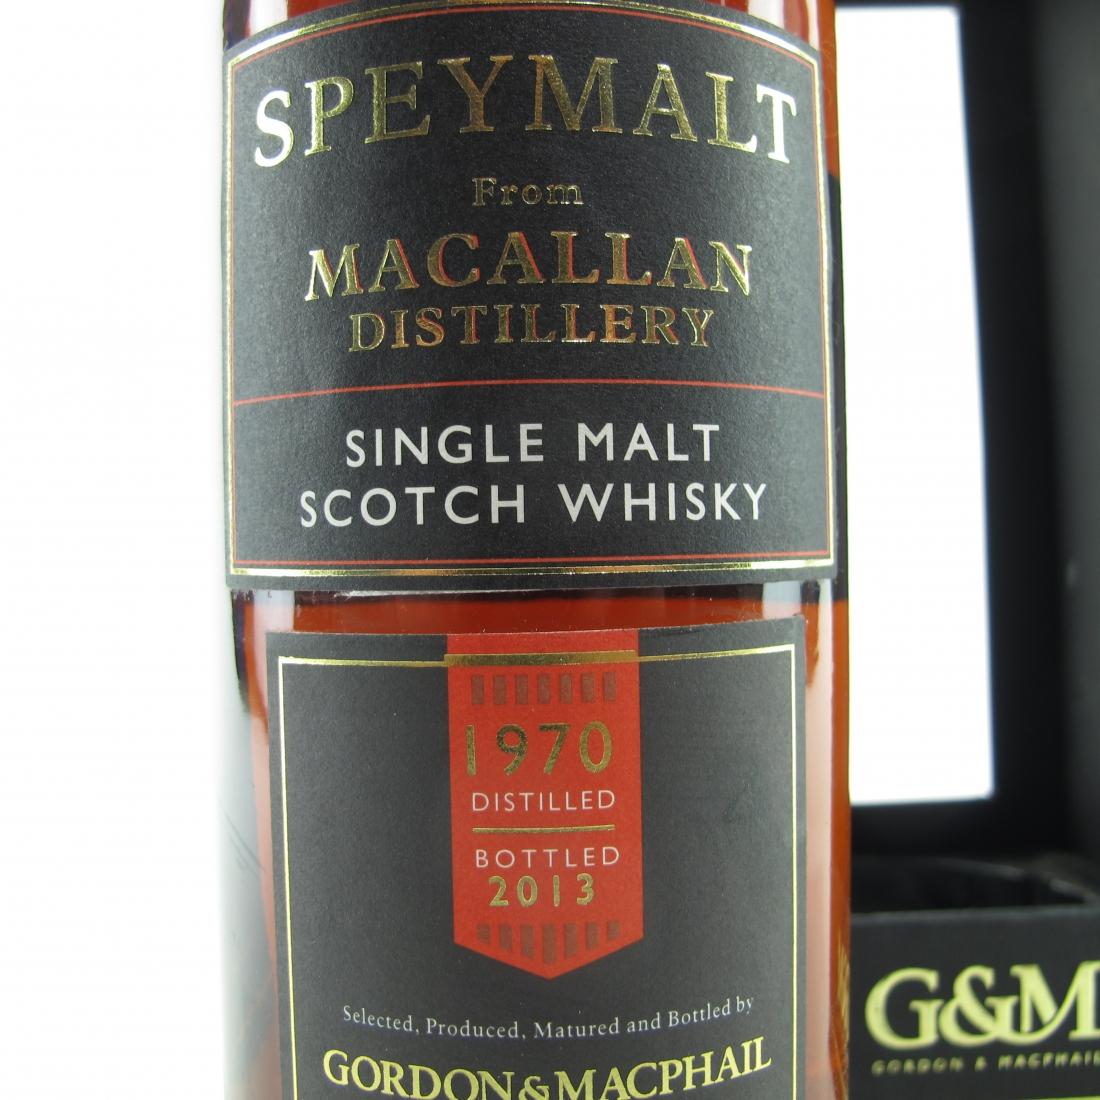 Macallan 1970 Speymalt Gordon and MacPhail 75cl / US Import